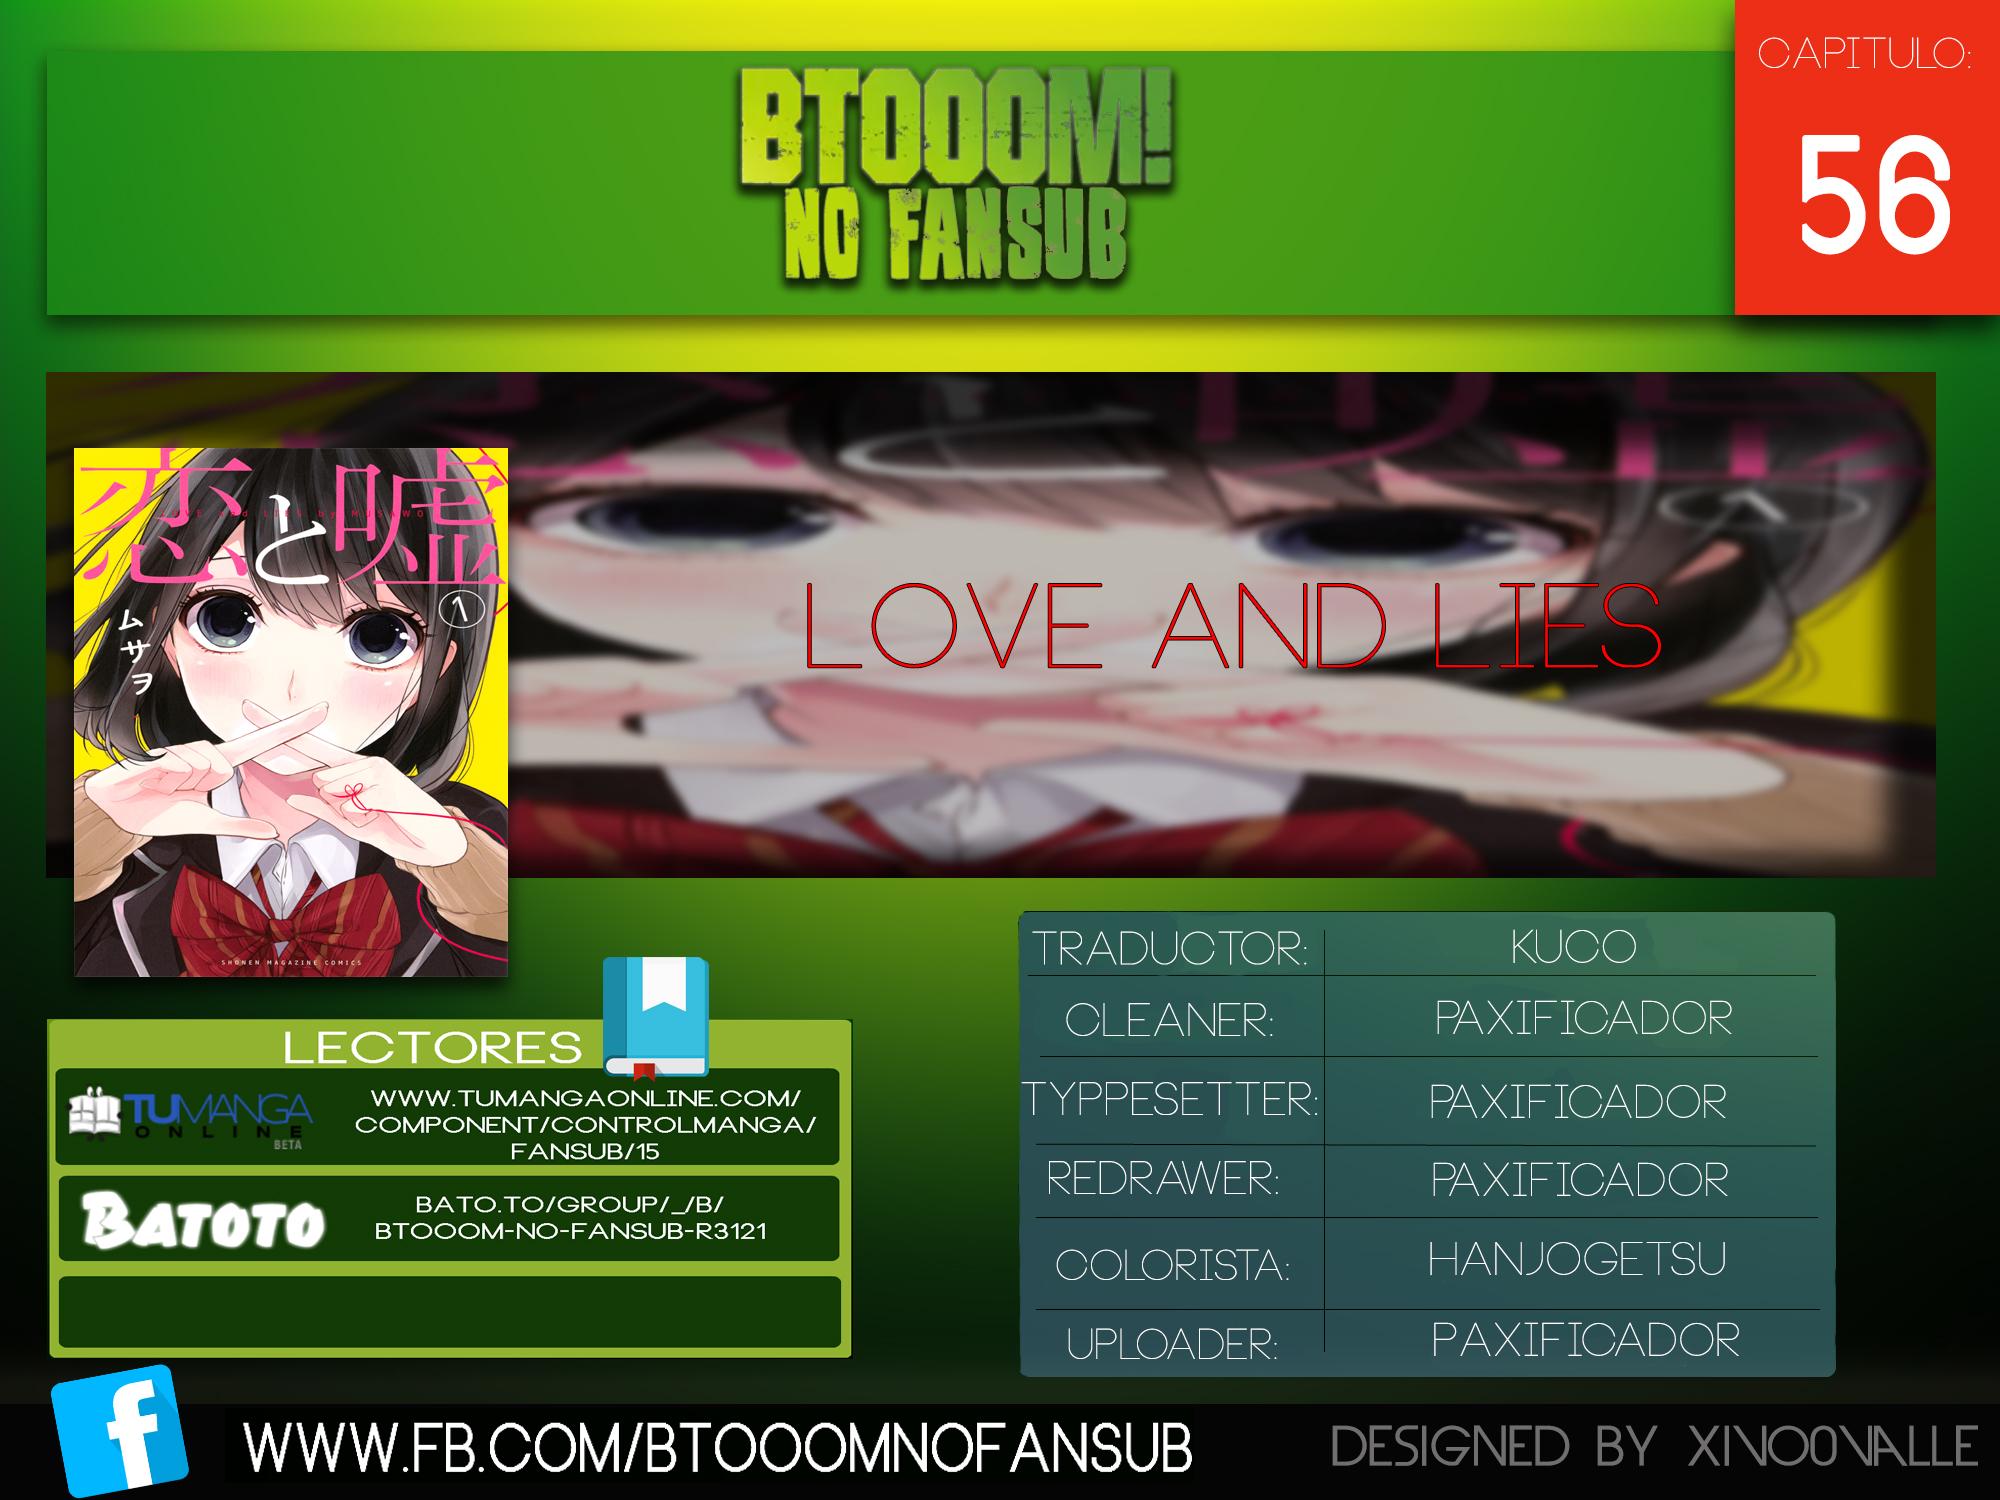 http://c5.ninemanga.com/es_manga/14/14734/418178/18e8fd13b330e44b53cbbfd4fd6ea87d.jpg Page 1